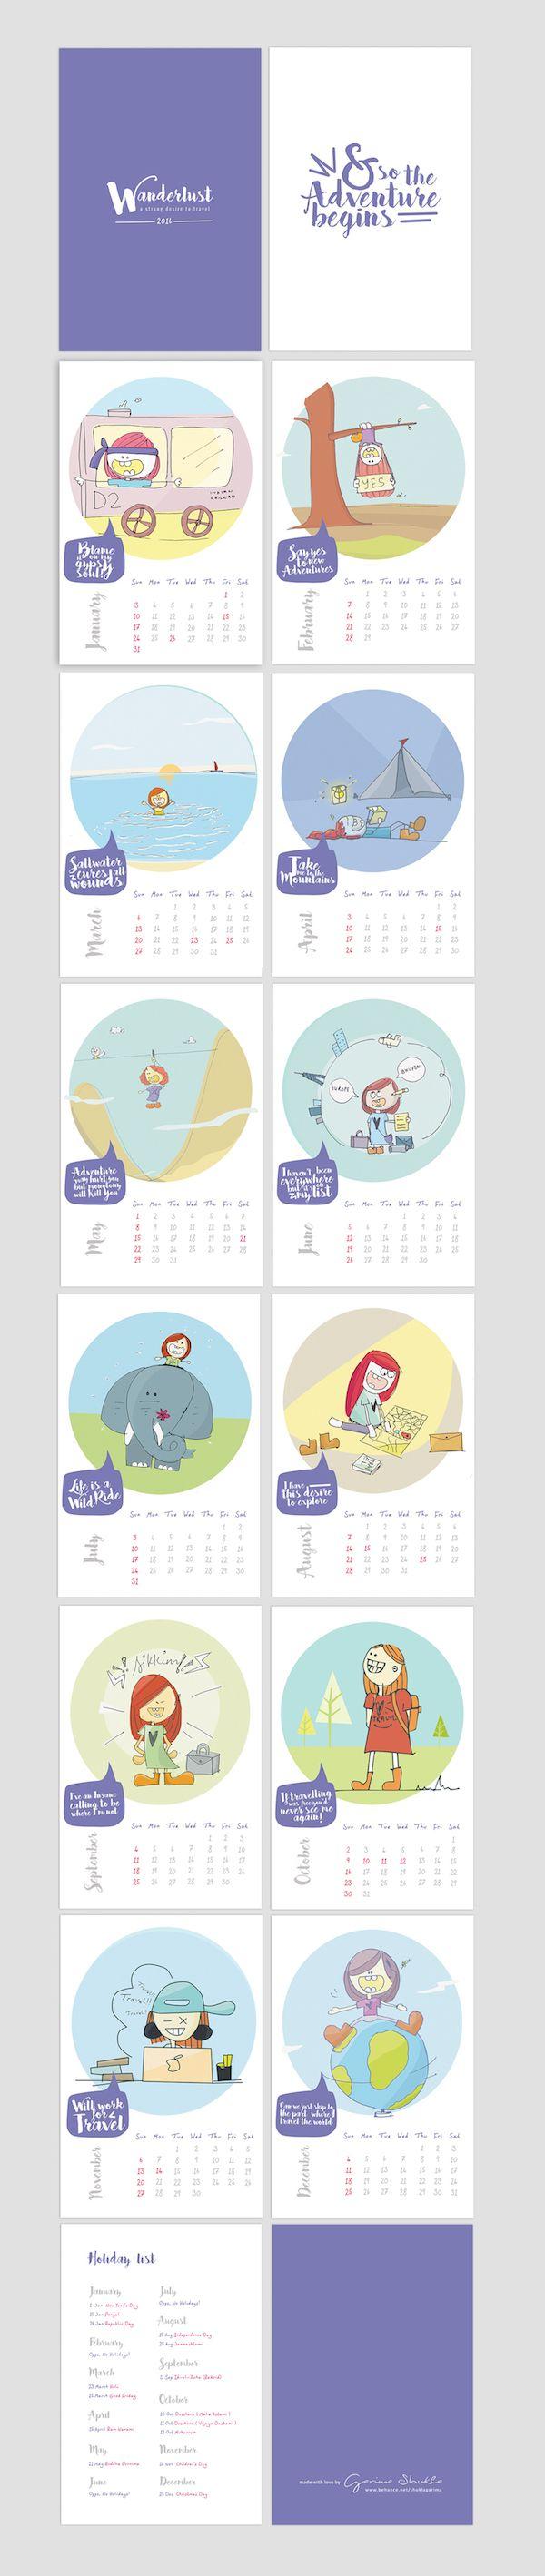 creative-2016-calender-designs